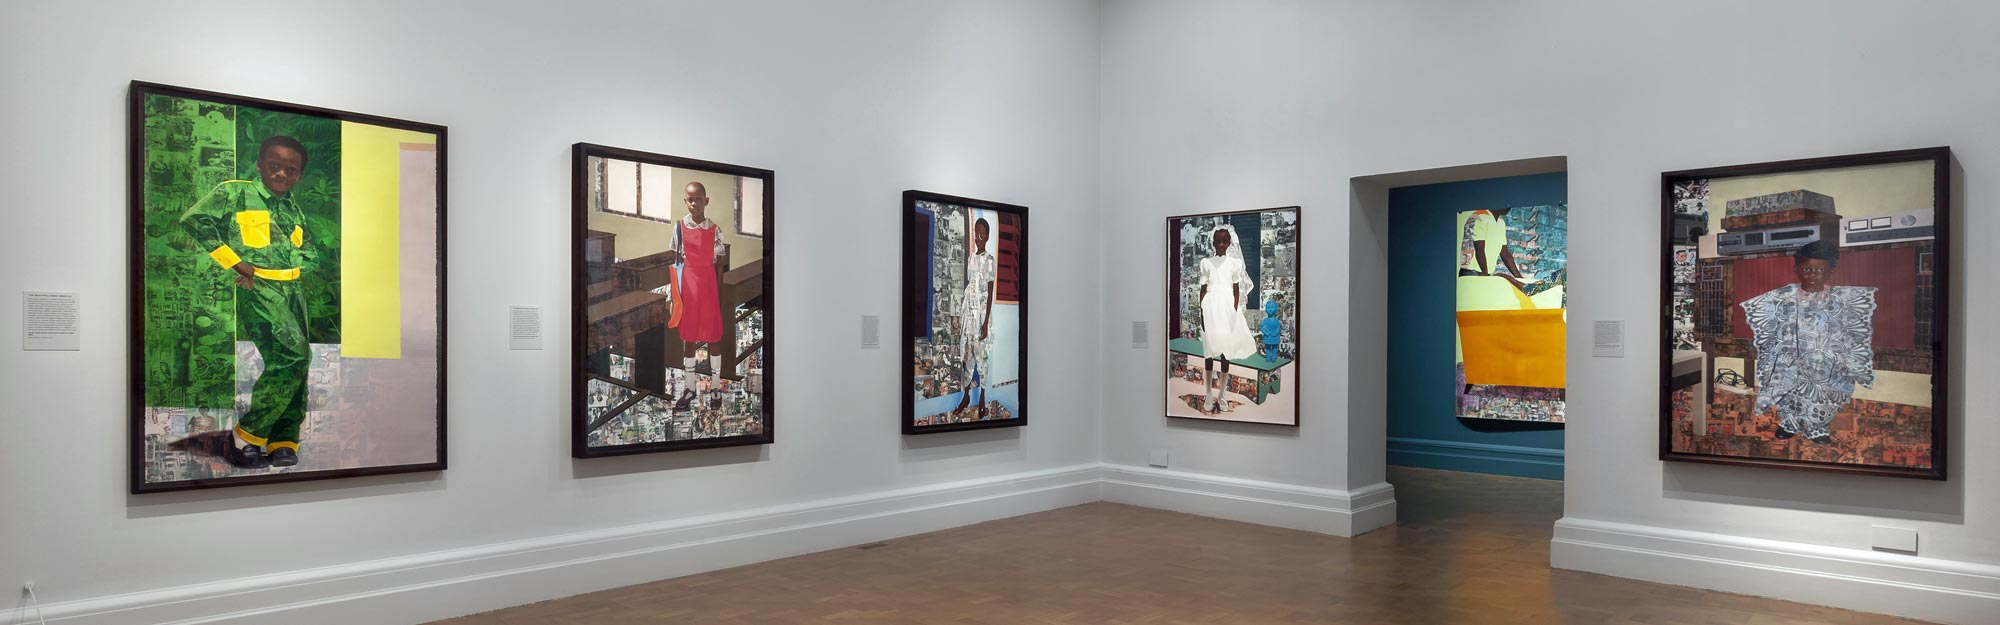 Njideka Akunyili Crosby,  The Beautyful Ones , National Portrait Gallery London, exhibition view. Image courtesy: National Portrait Gallery London